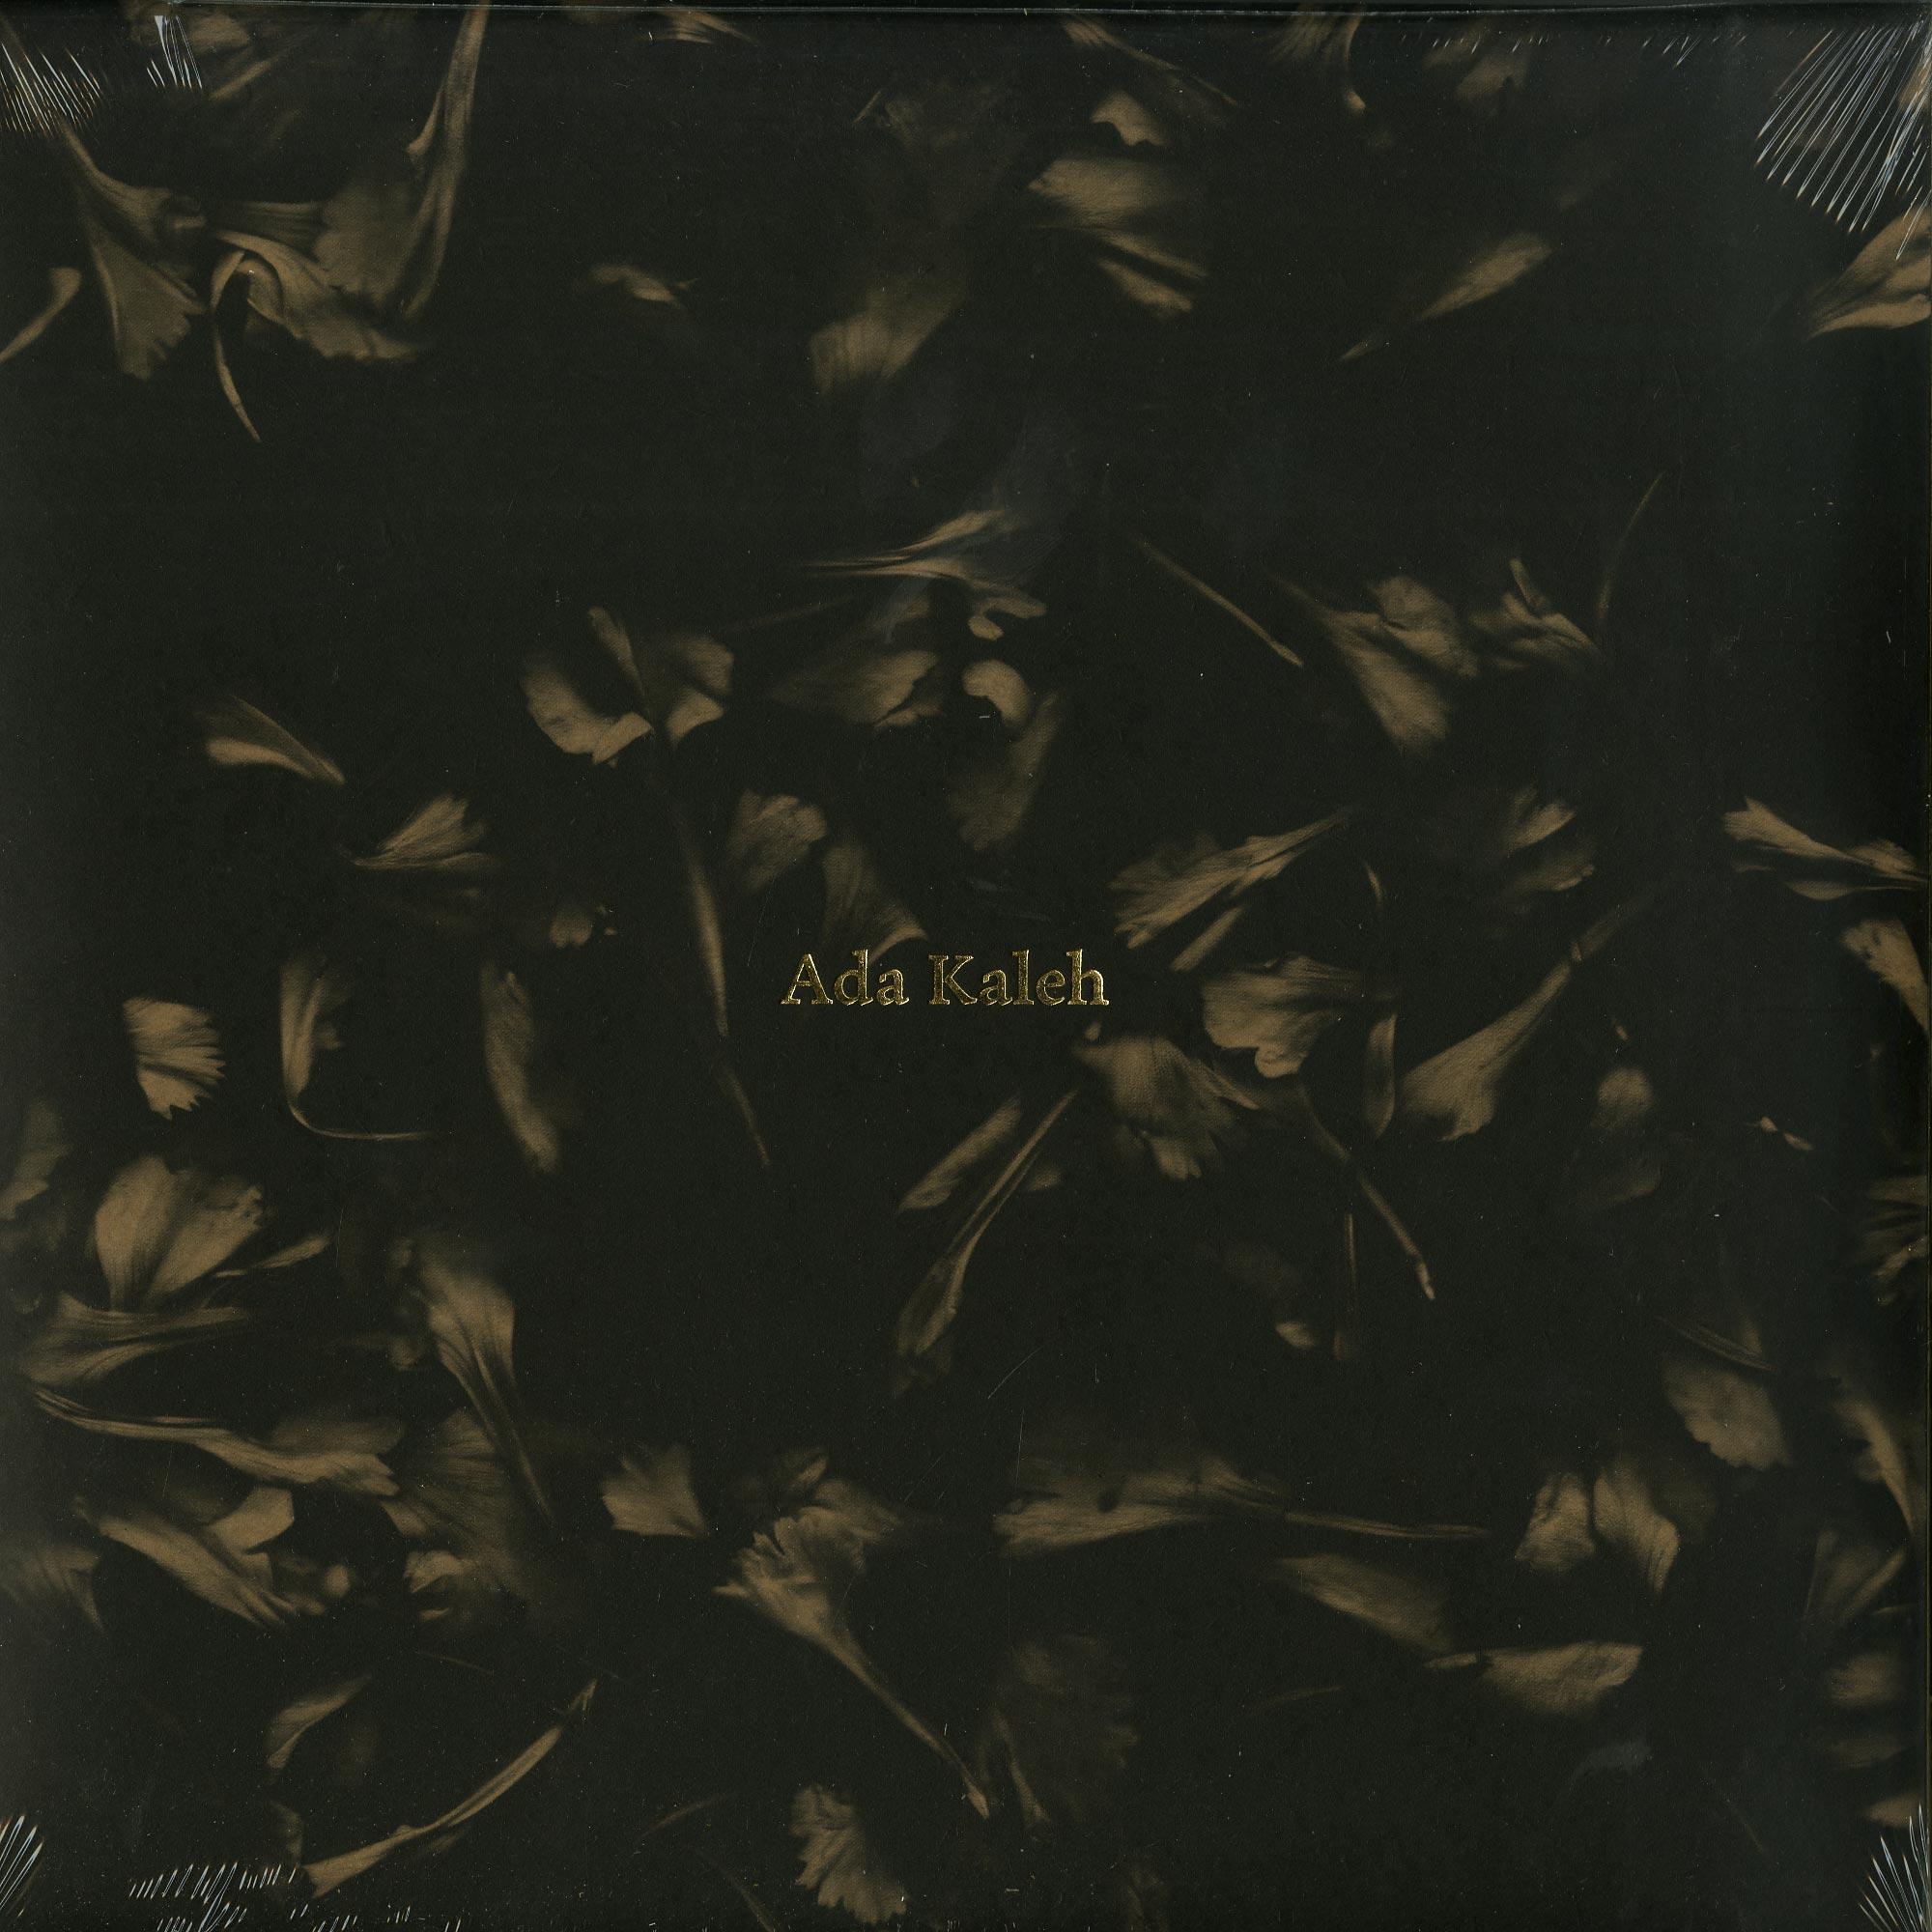 Ada Kaleh - DENE DESCRIS LP PART 1